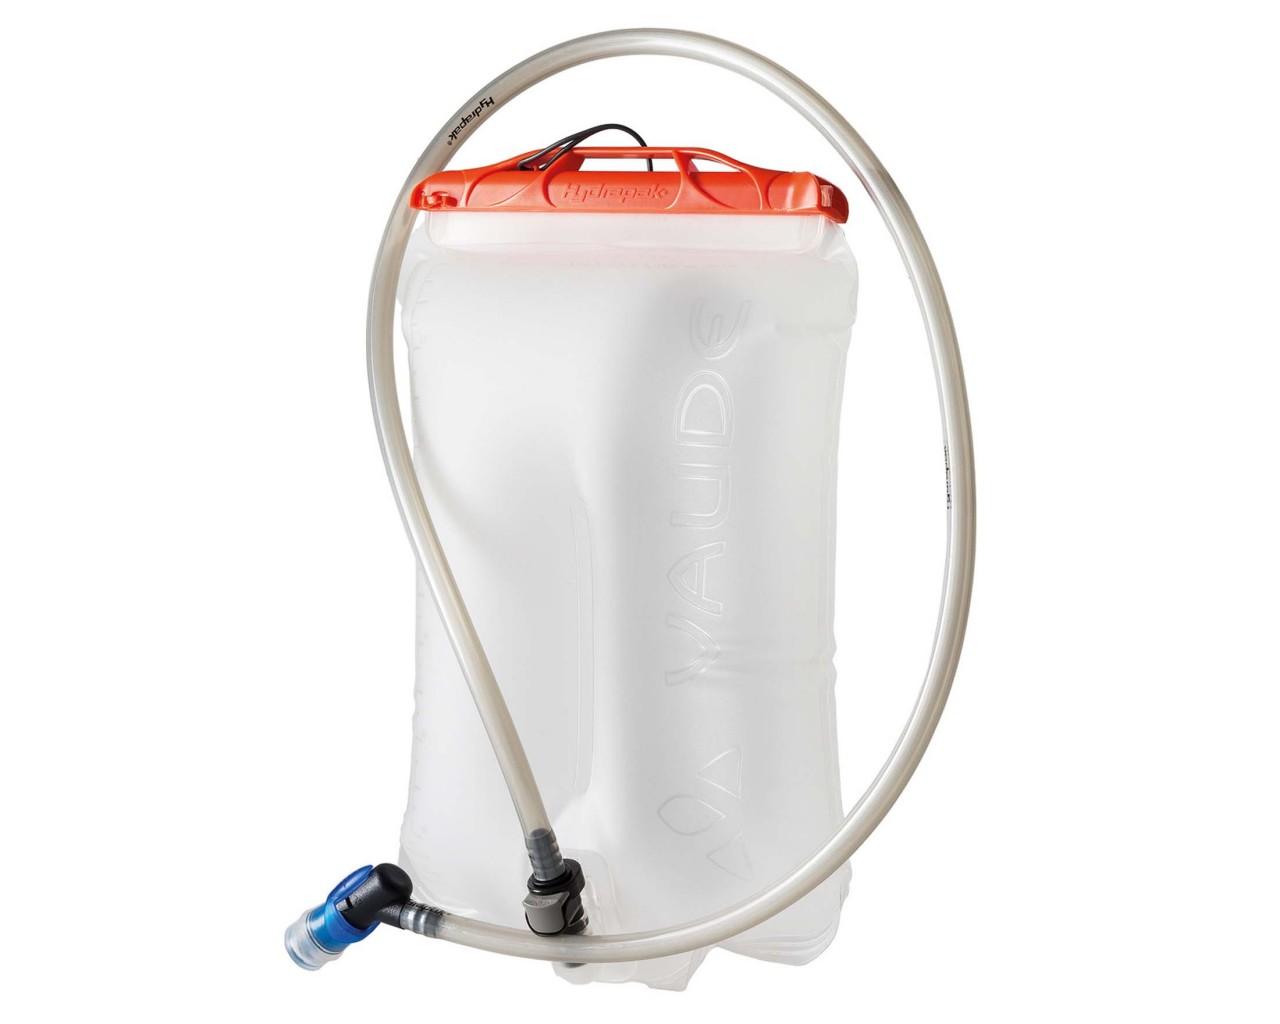 Vaude Aquarius Pro 2.0 litres hydration bladder for bike pack